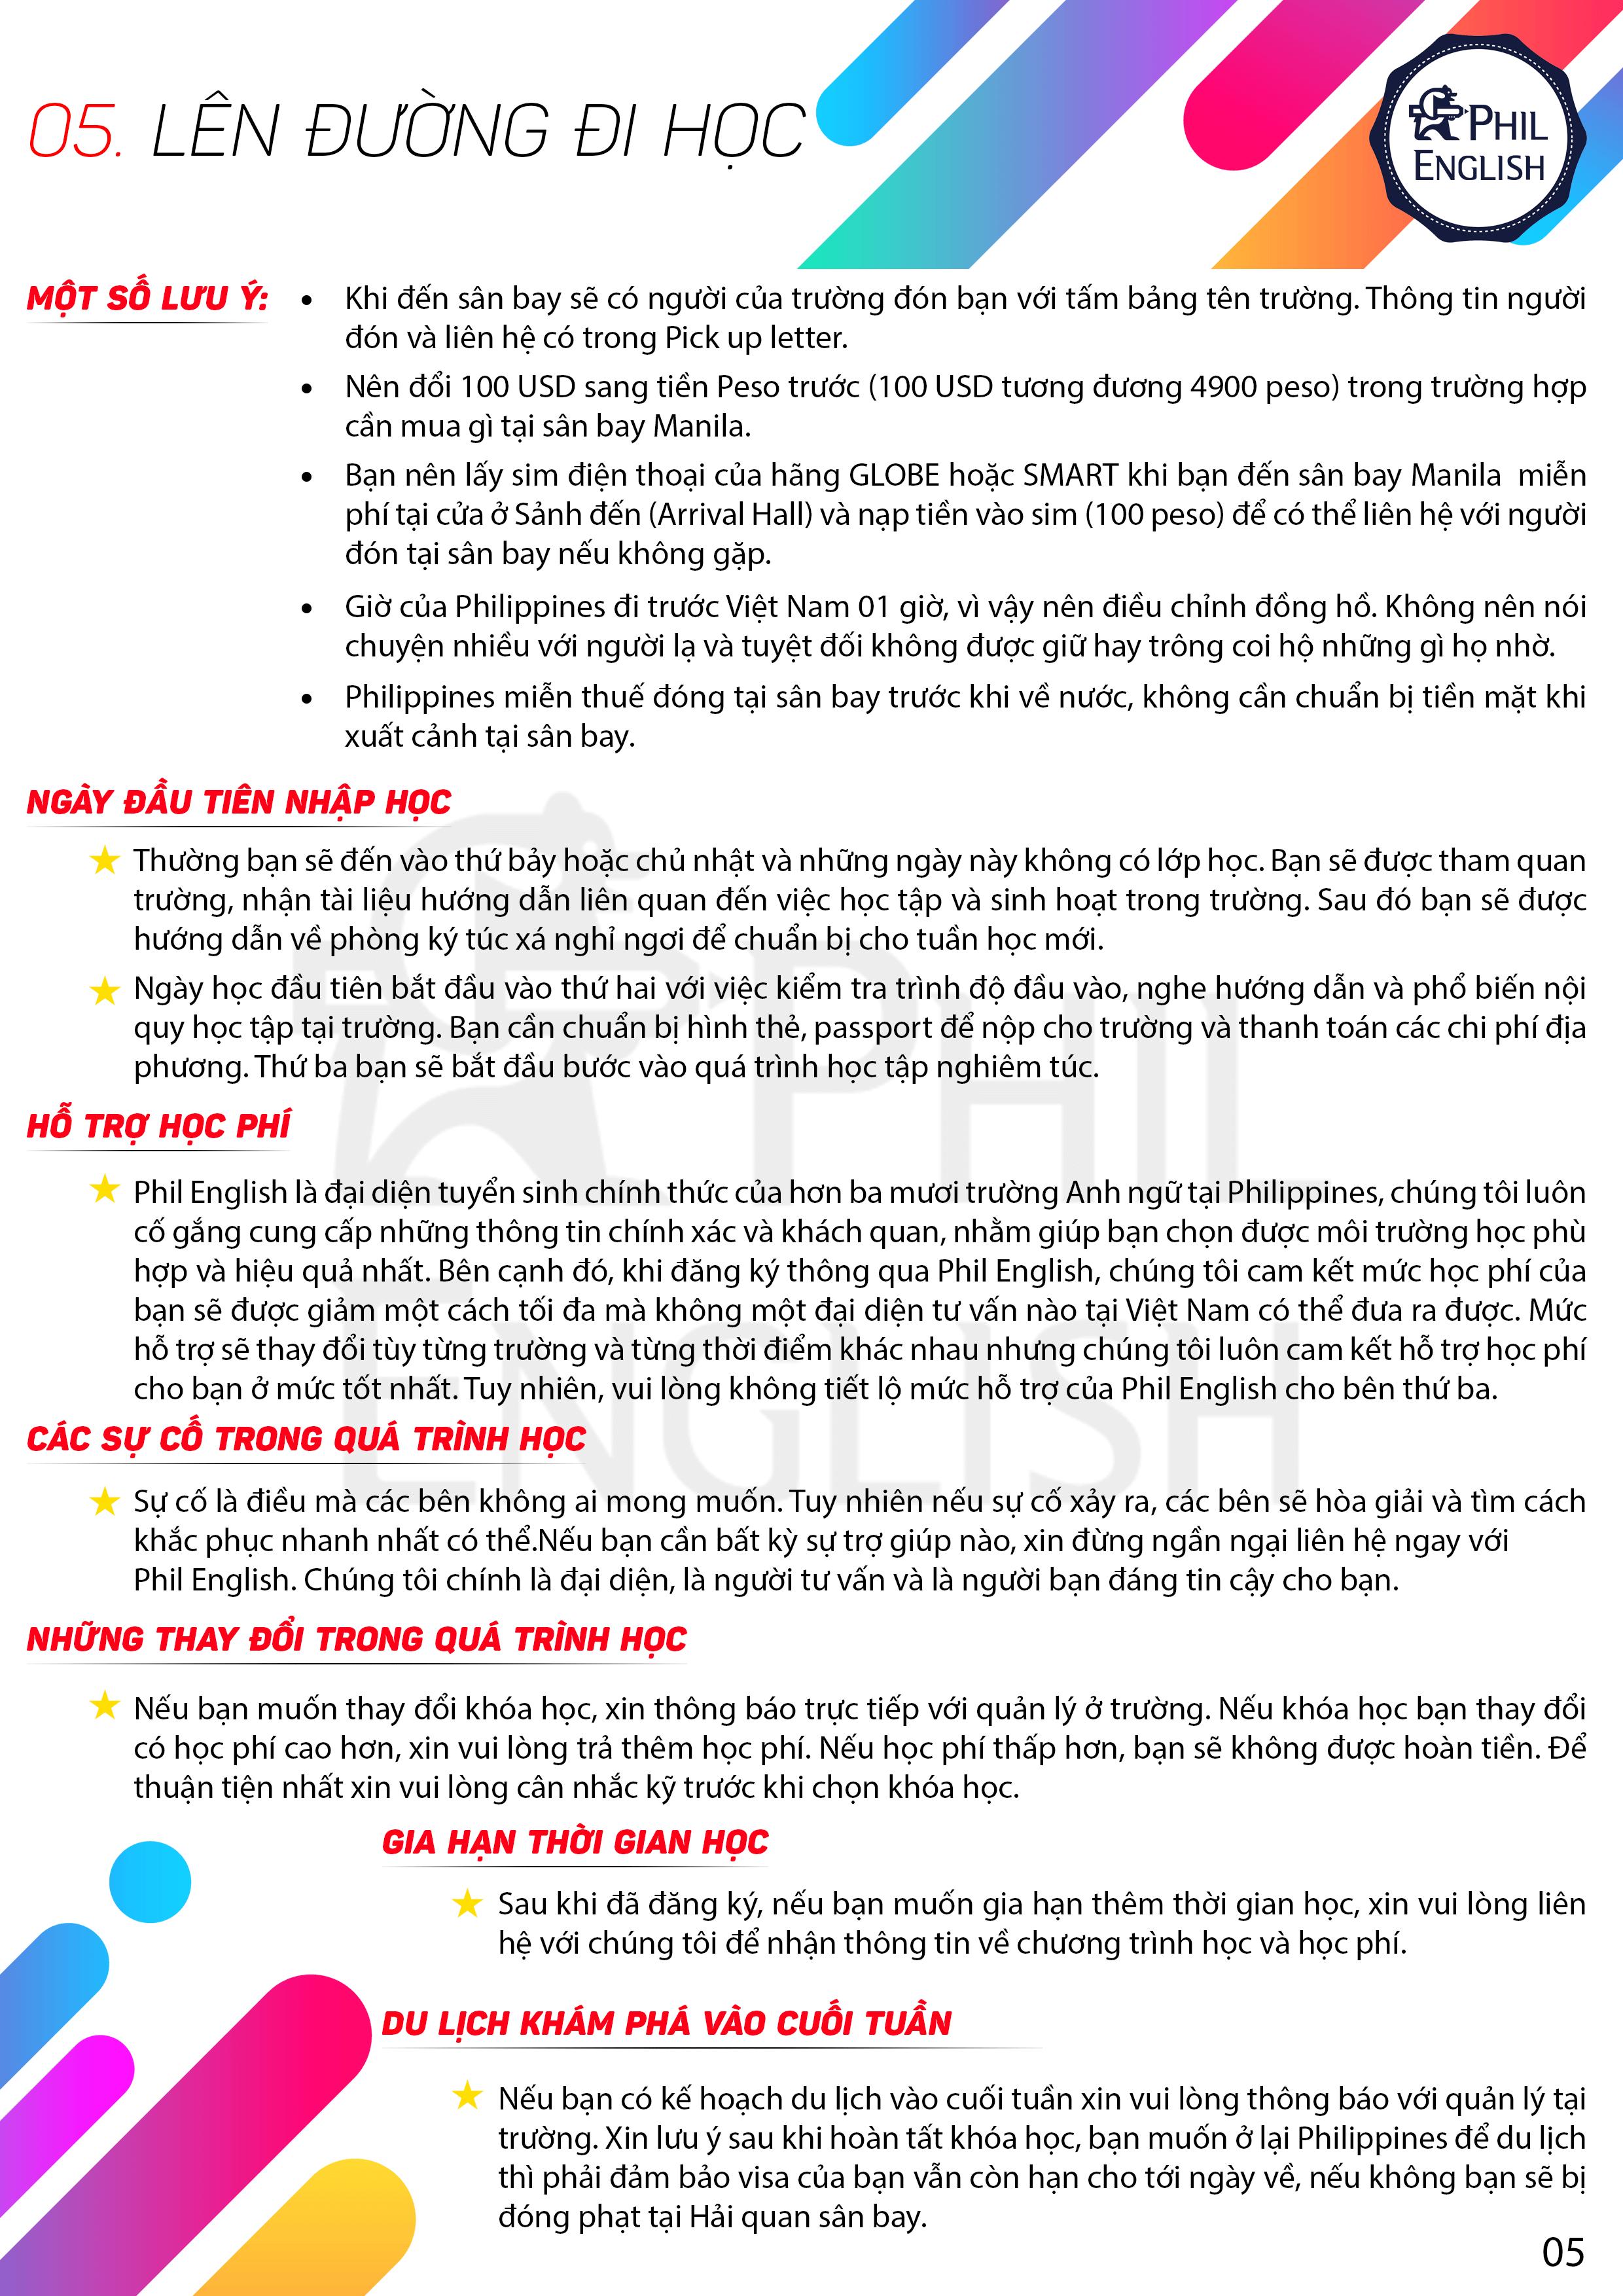 huong-dan-truoc-khi-nhap-hoc-tai-philippines-6